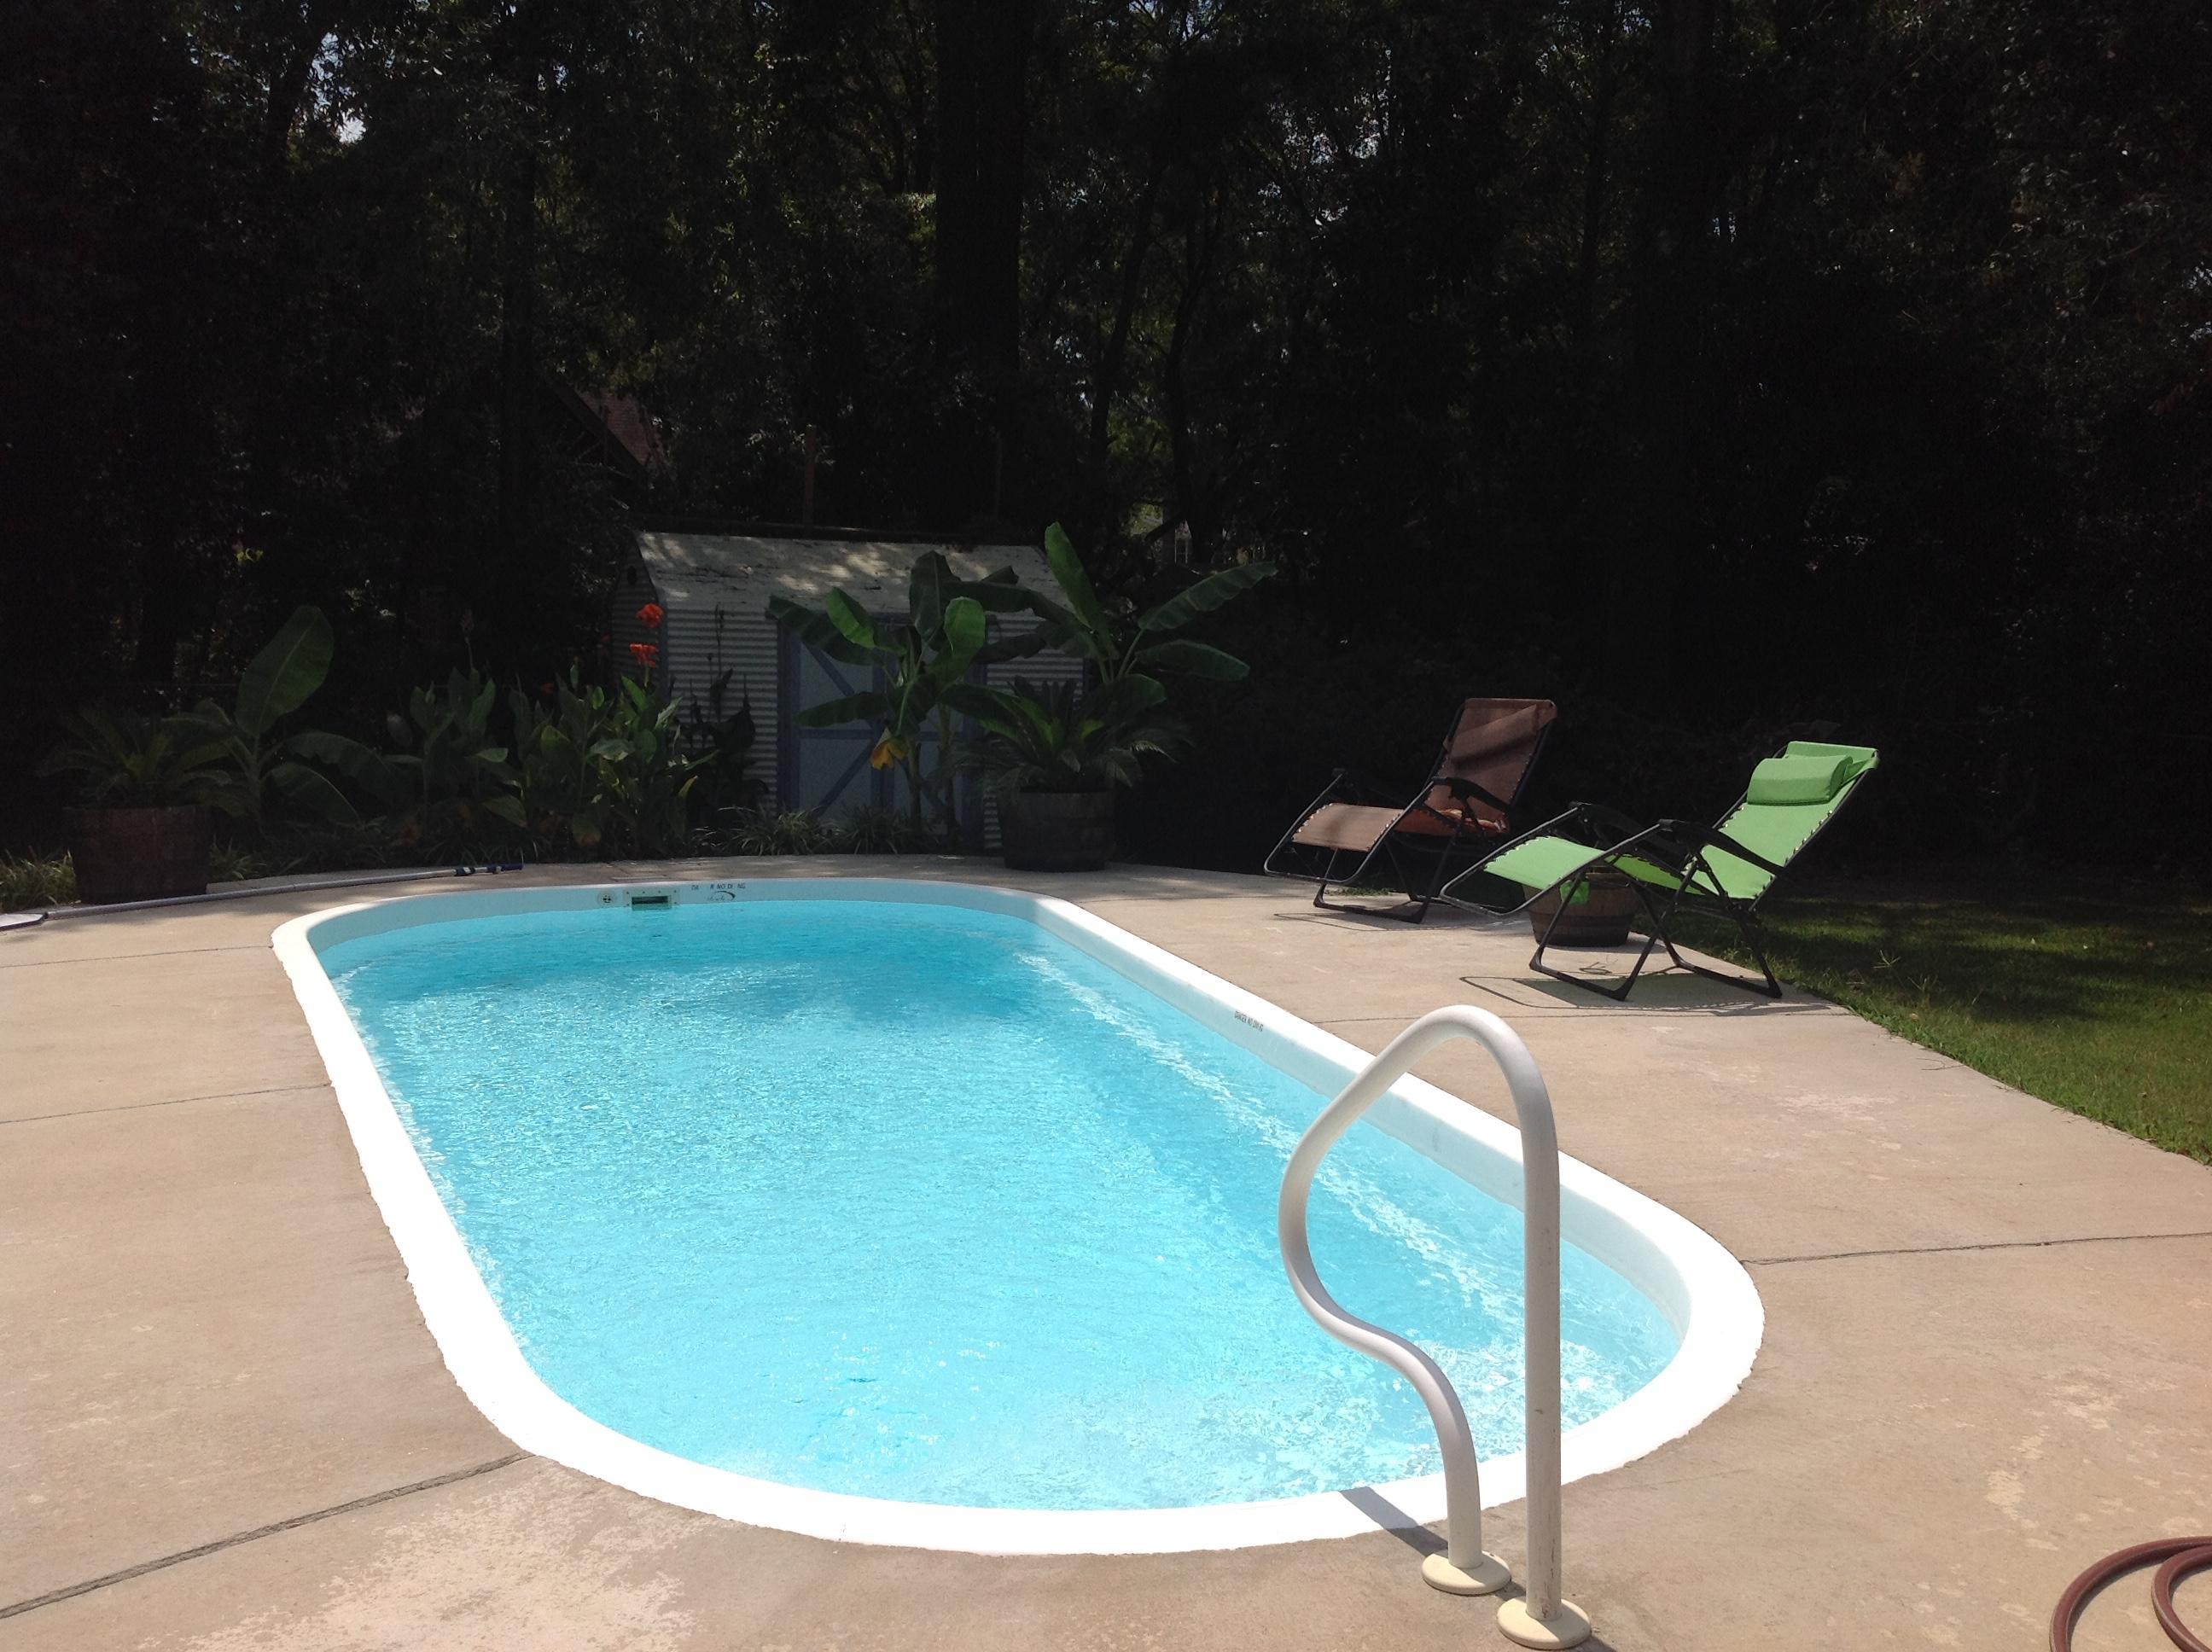 Belvedere II Homes For Sale - 122 Dogwood, Eutawville, SC - 37